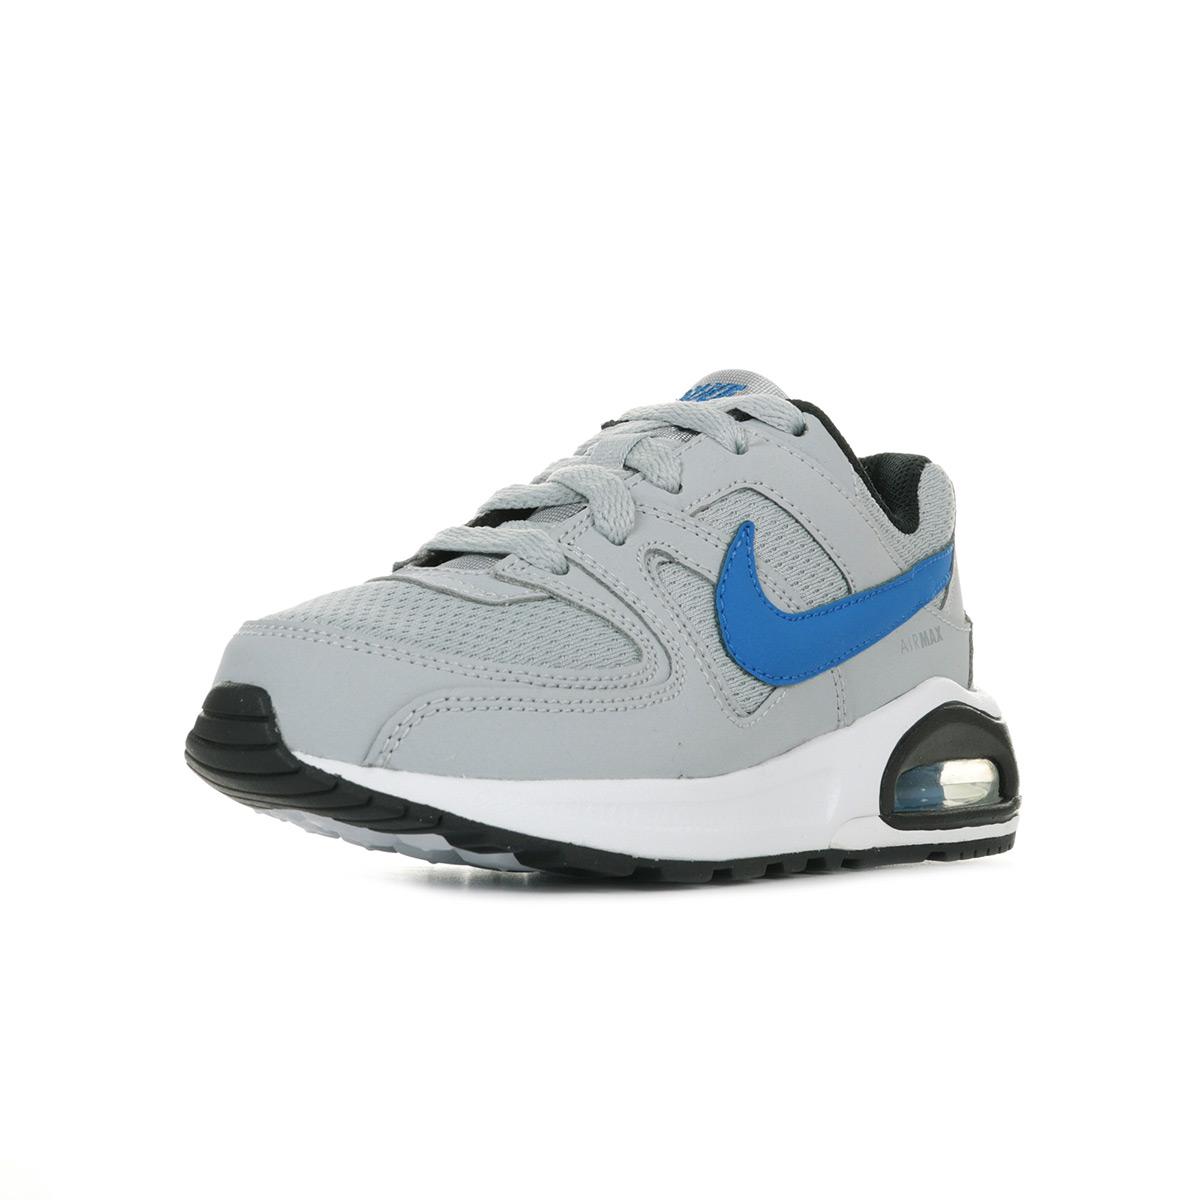 promo code 00a5b 5d343 Nike Air Max Command Flex (PS) ...